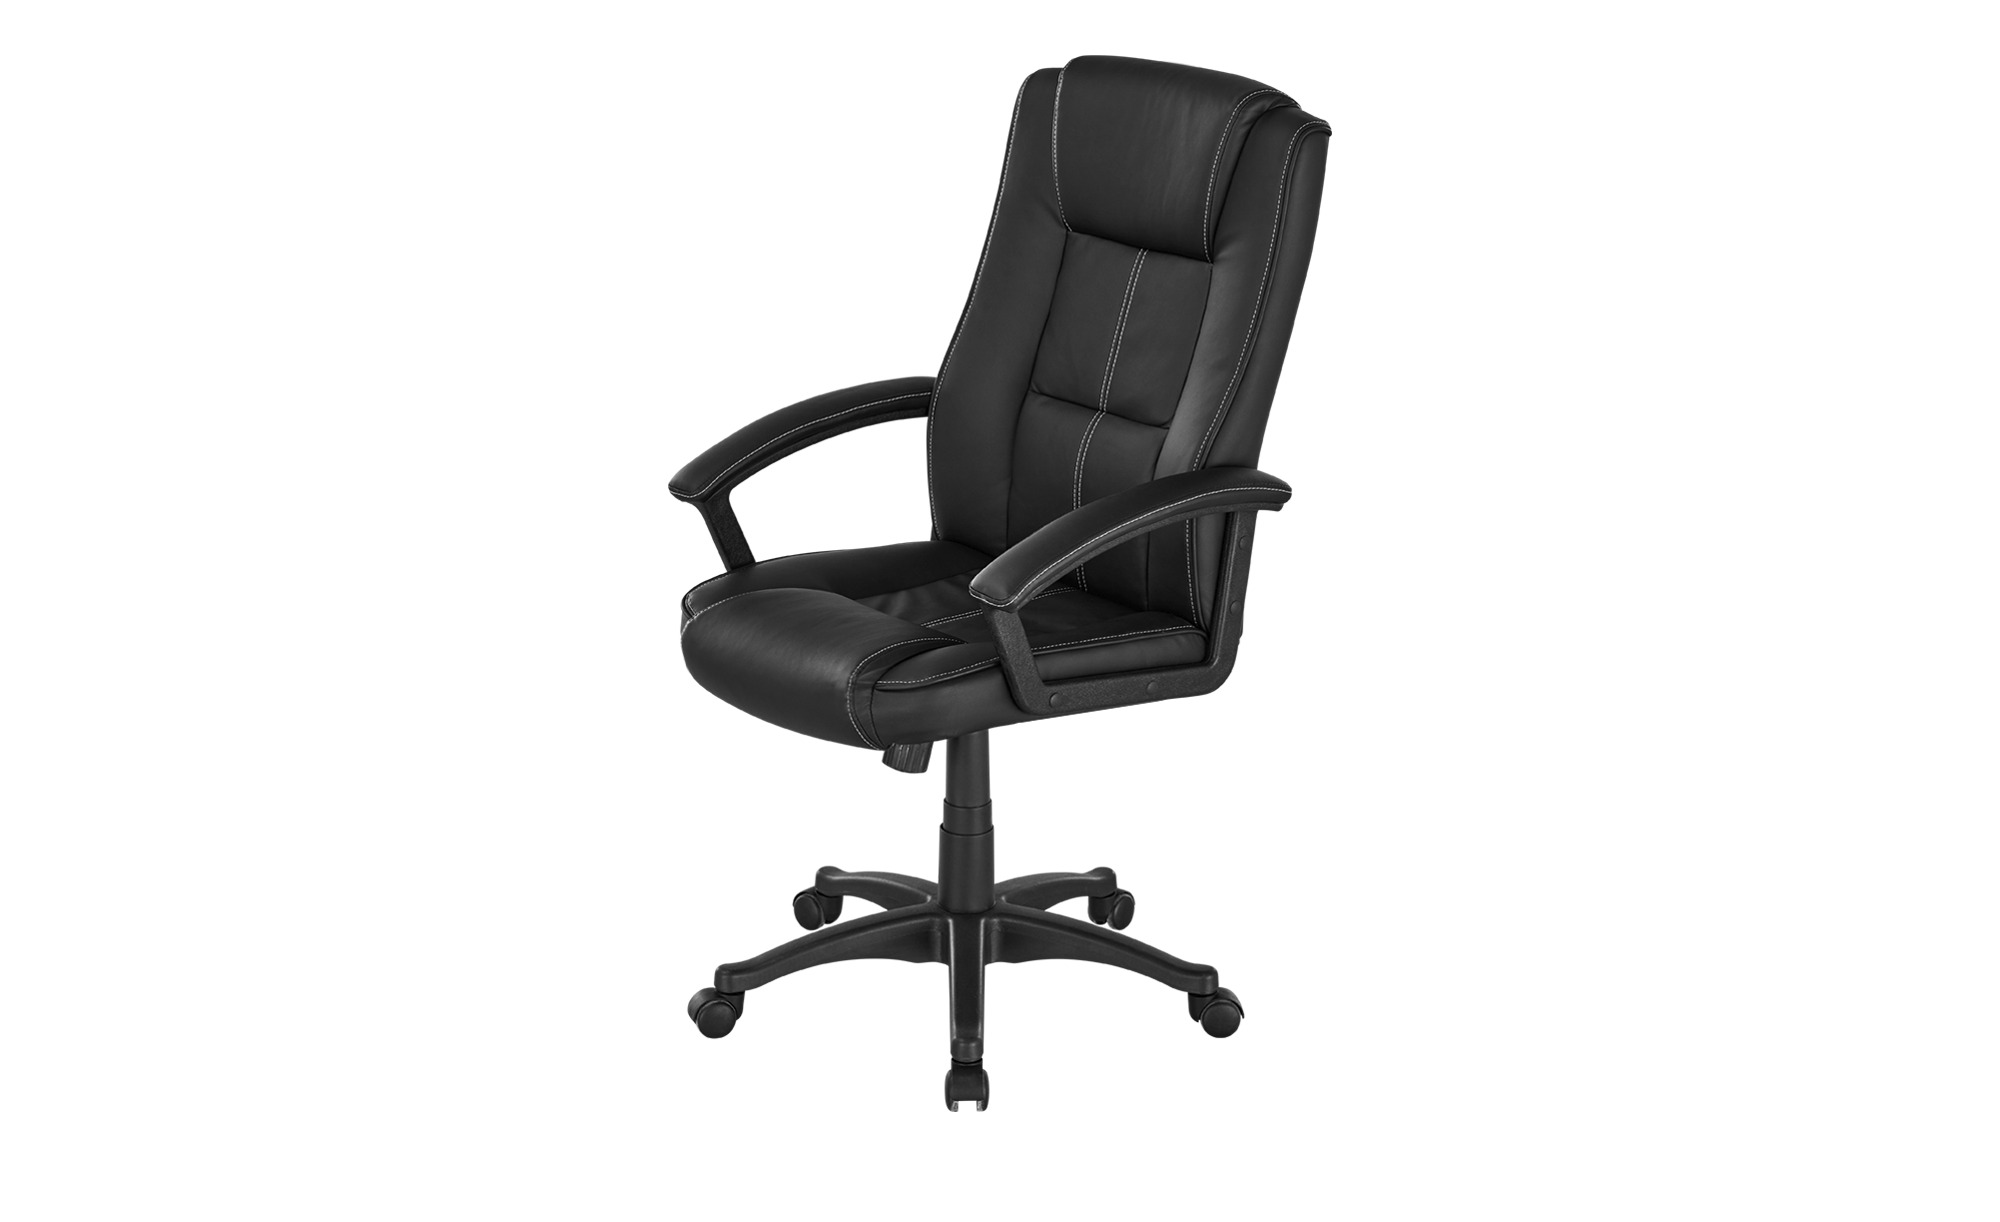 Chefsessel Kunstleder Bibert ¦ schwarz Stühle > Bürostühle > Chefsessel - Höffner